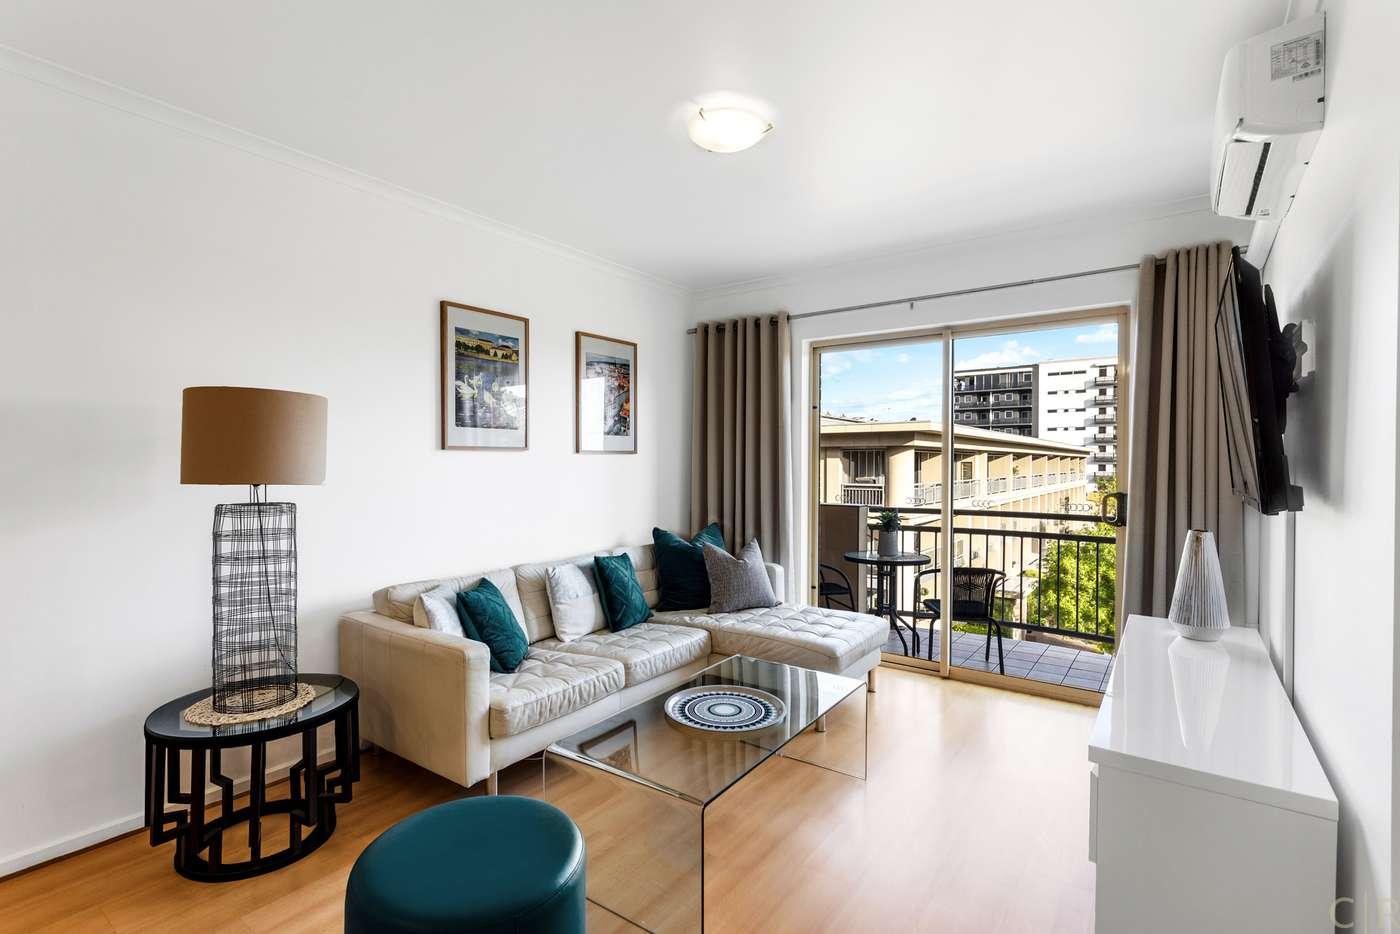 Main view of Homely apartment listing, 28B/188 Carrington Street, Adelaide SA 5000